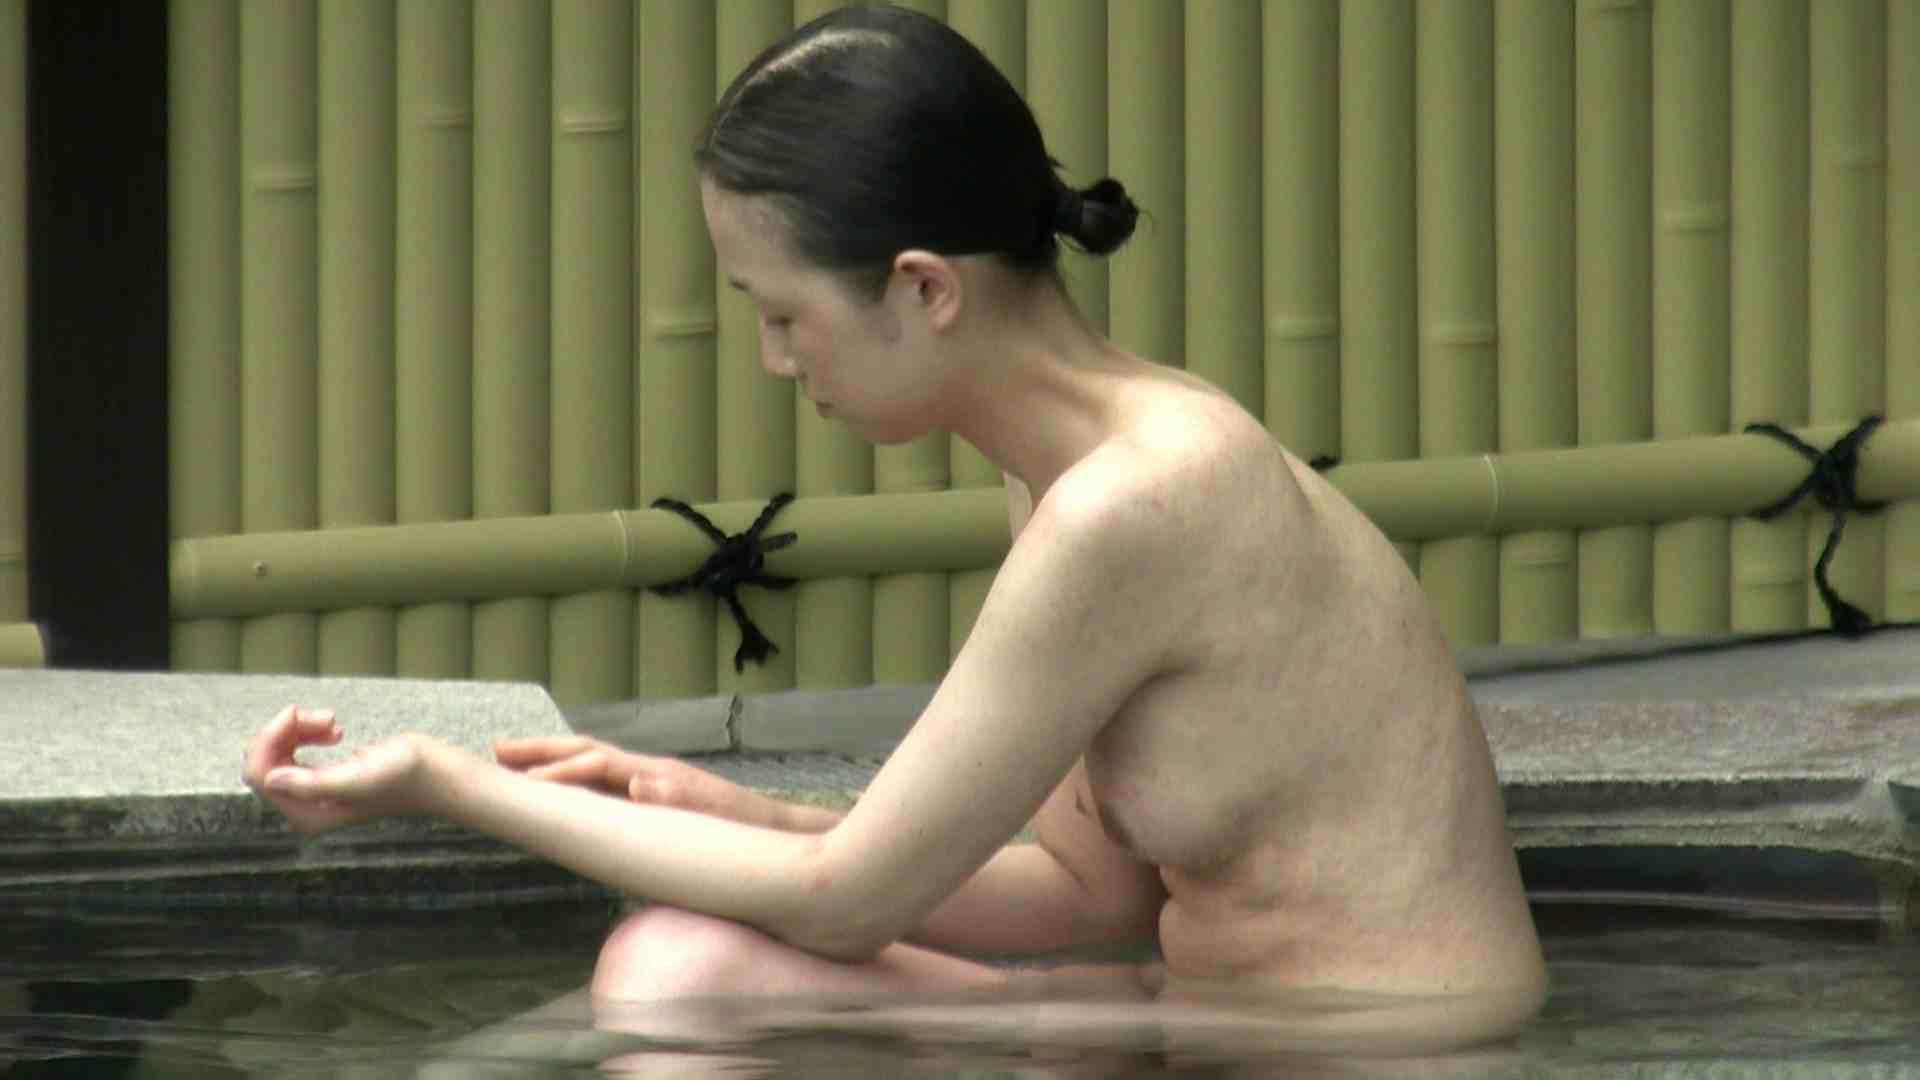 Aquaな露天風呂Vol.661 OLセックス | 露天  105画像 79